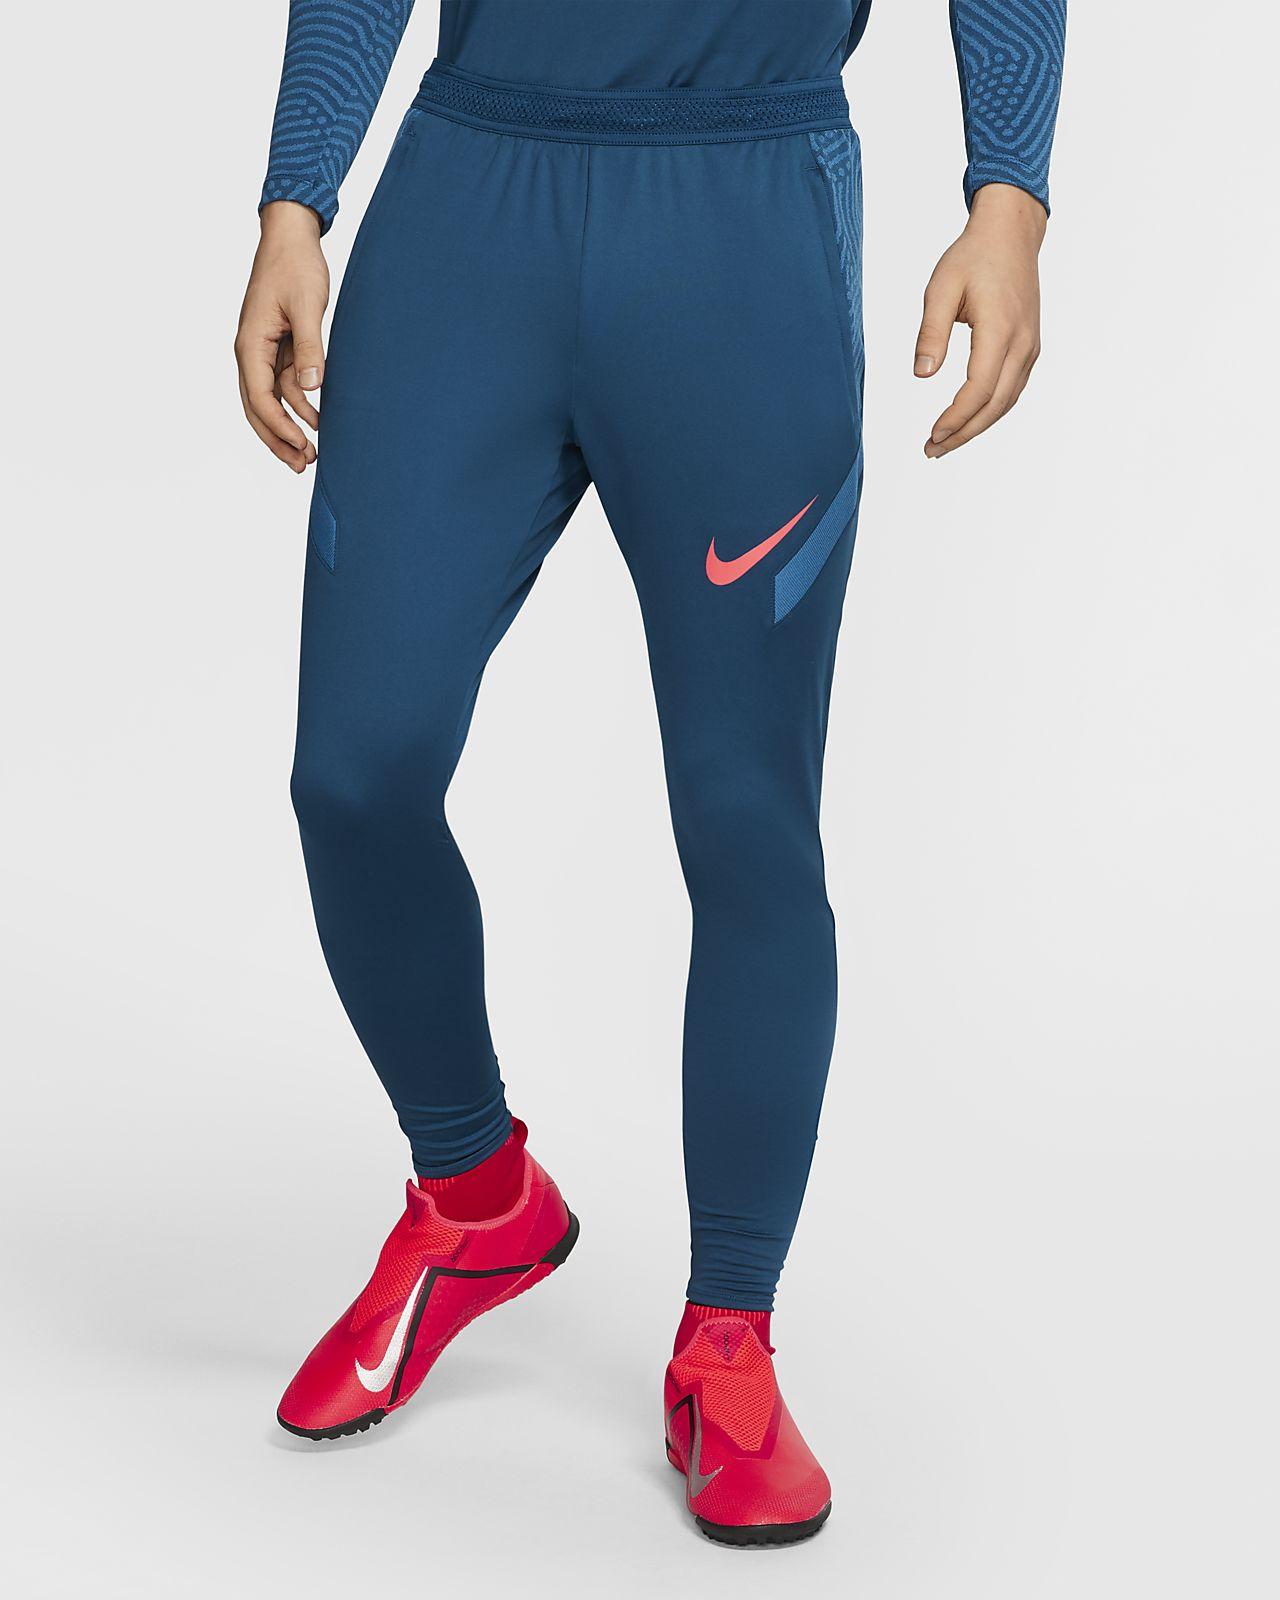 Nike Dri-FIT Strike Men's Football Pants